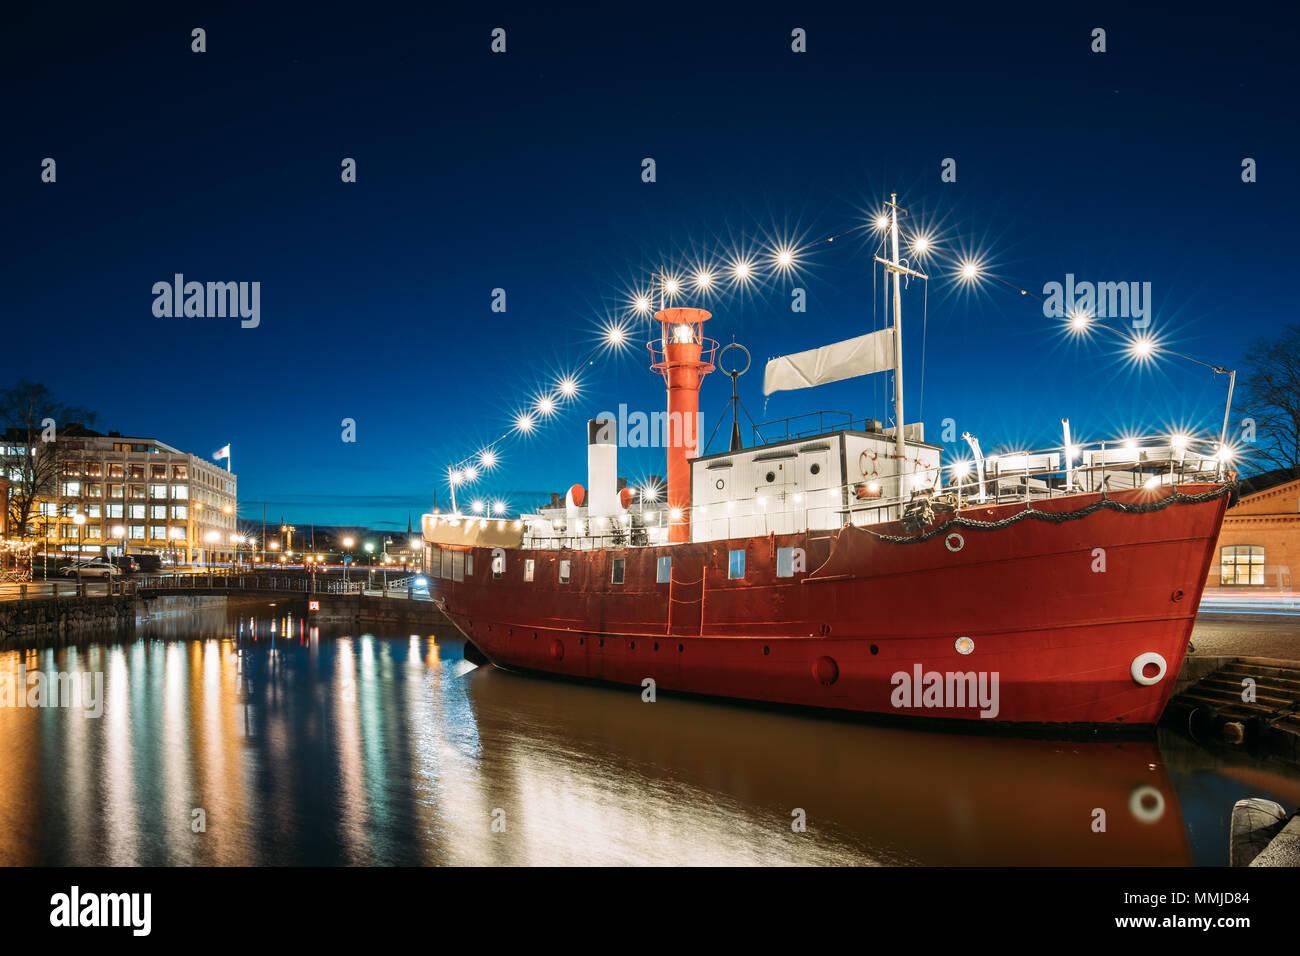 Helsinki, Finnland. Günstig Steamboat Restaurant am Abend Nacht Illuminationen. Stockbild